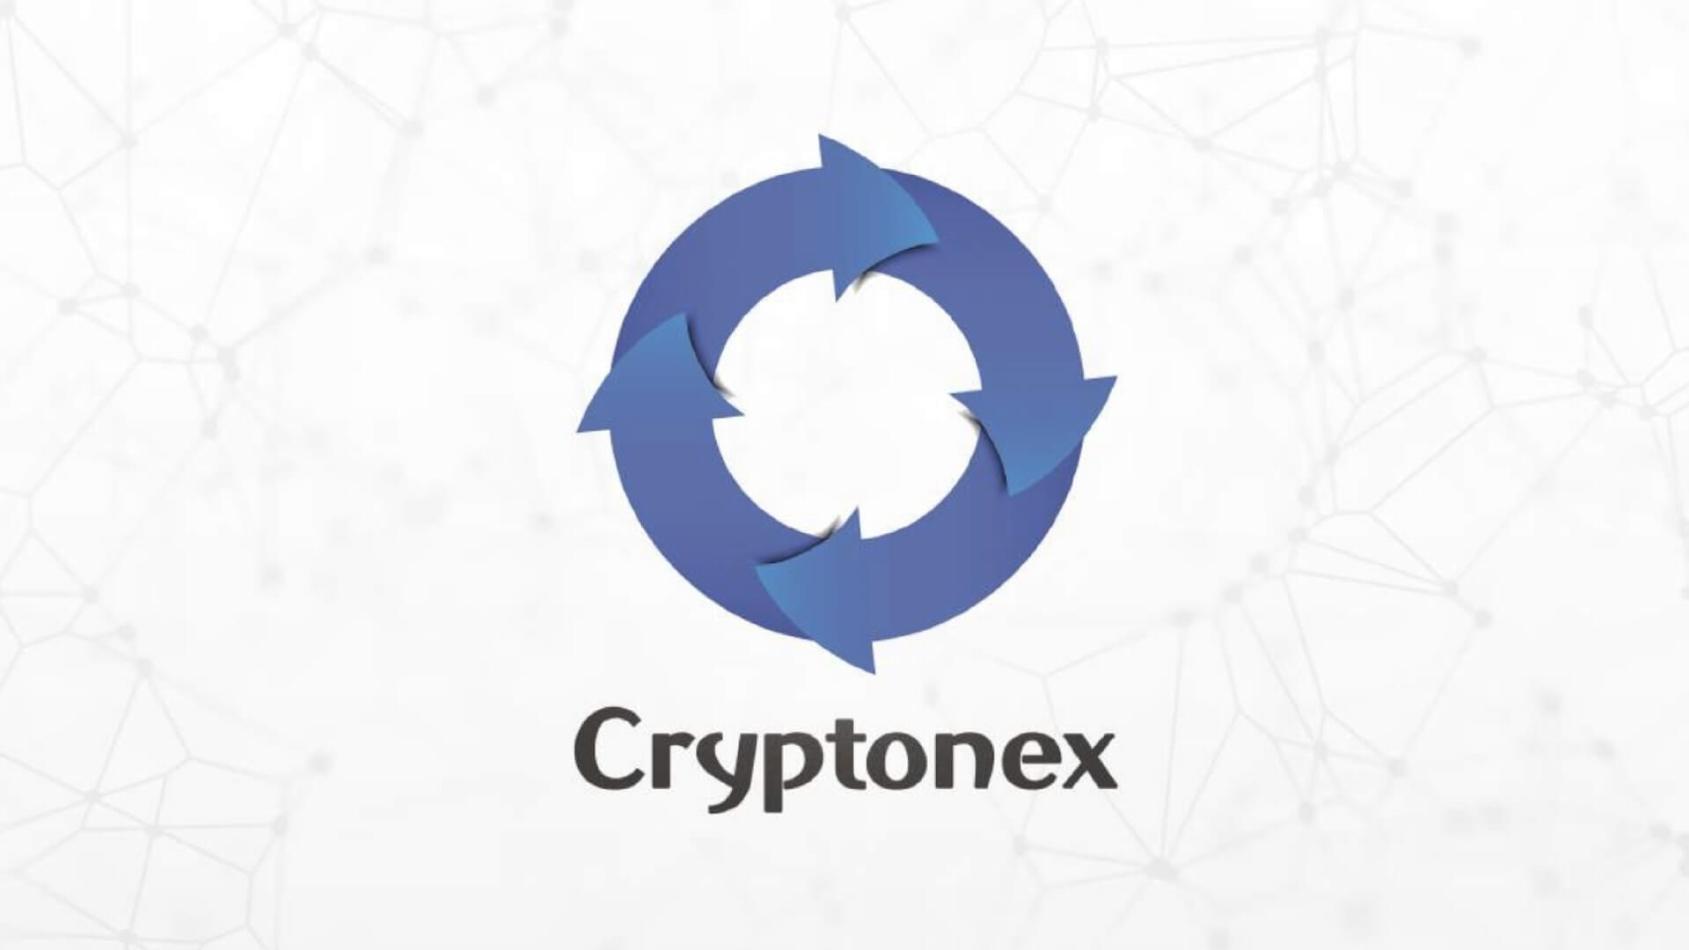 CNX Cryptonex in a Nutshell